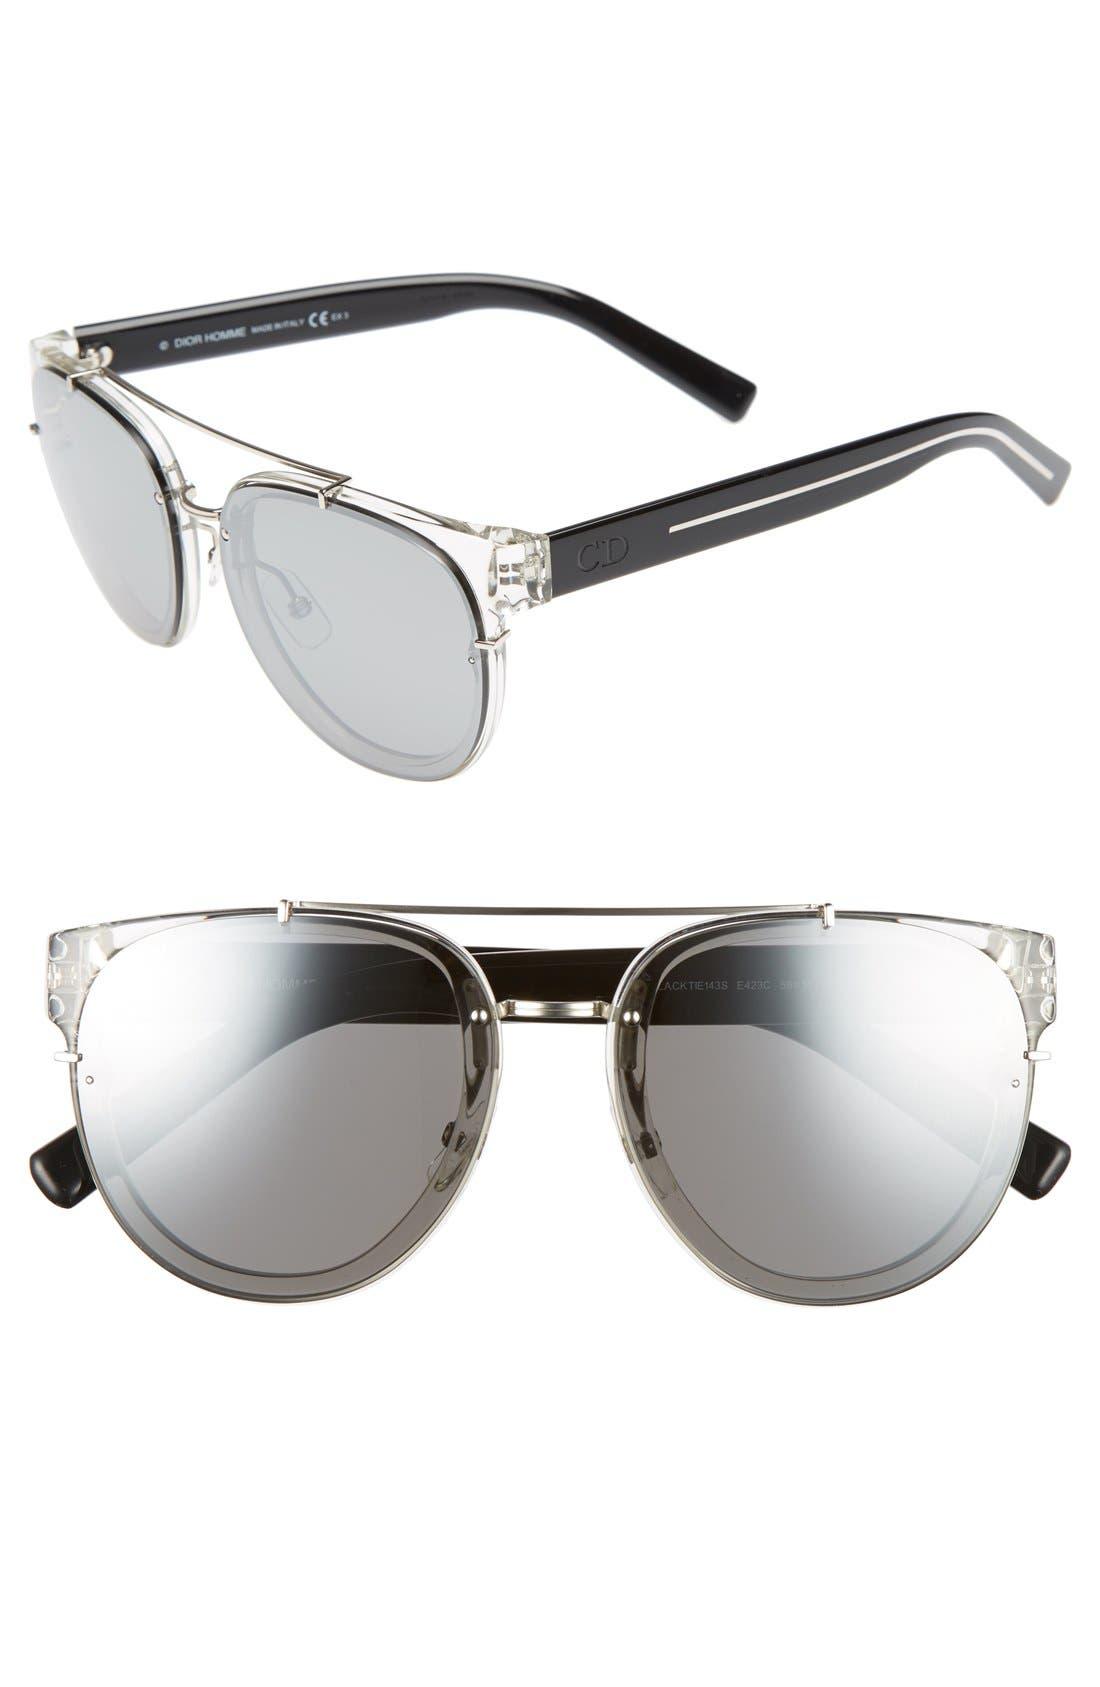 DIOR HOMME Black Tie 56mm Sunglasses